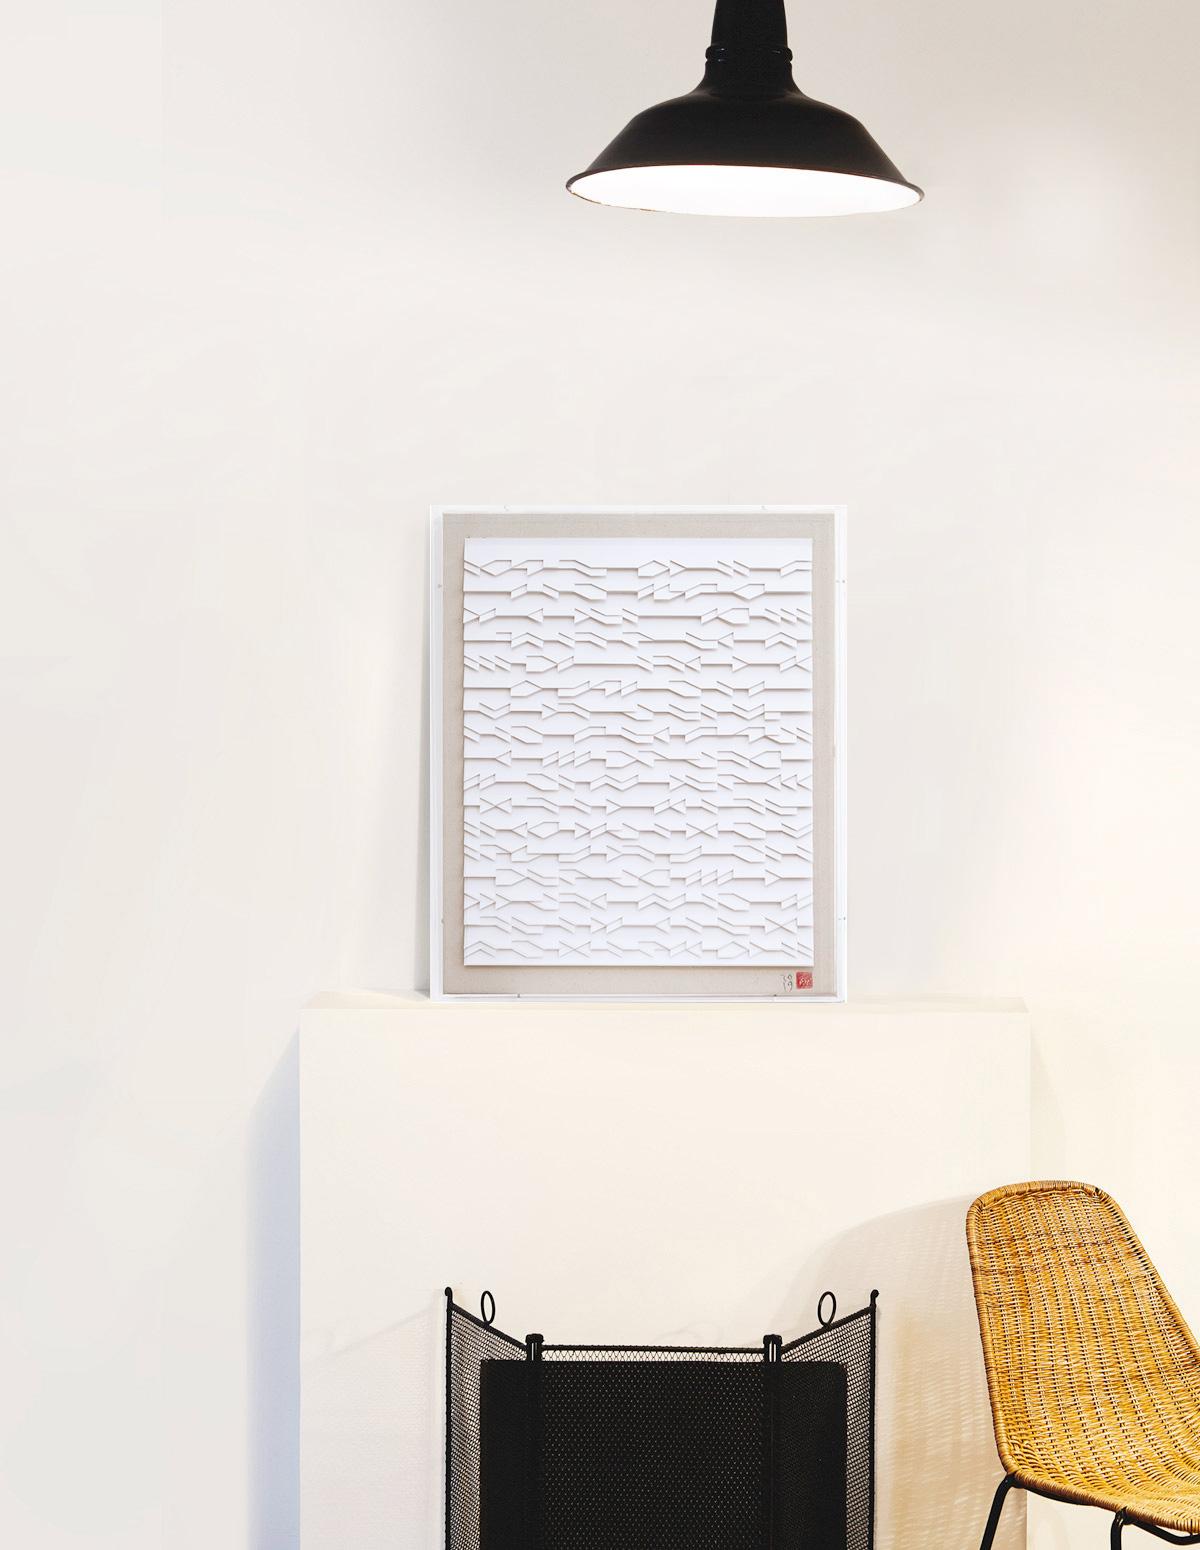 Fernando Daza - Oeuvre sur papier - Monochrome basik 1